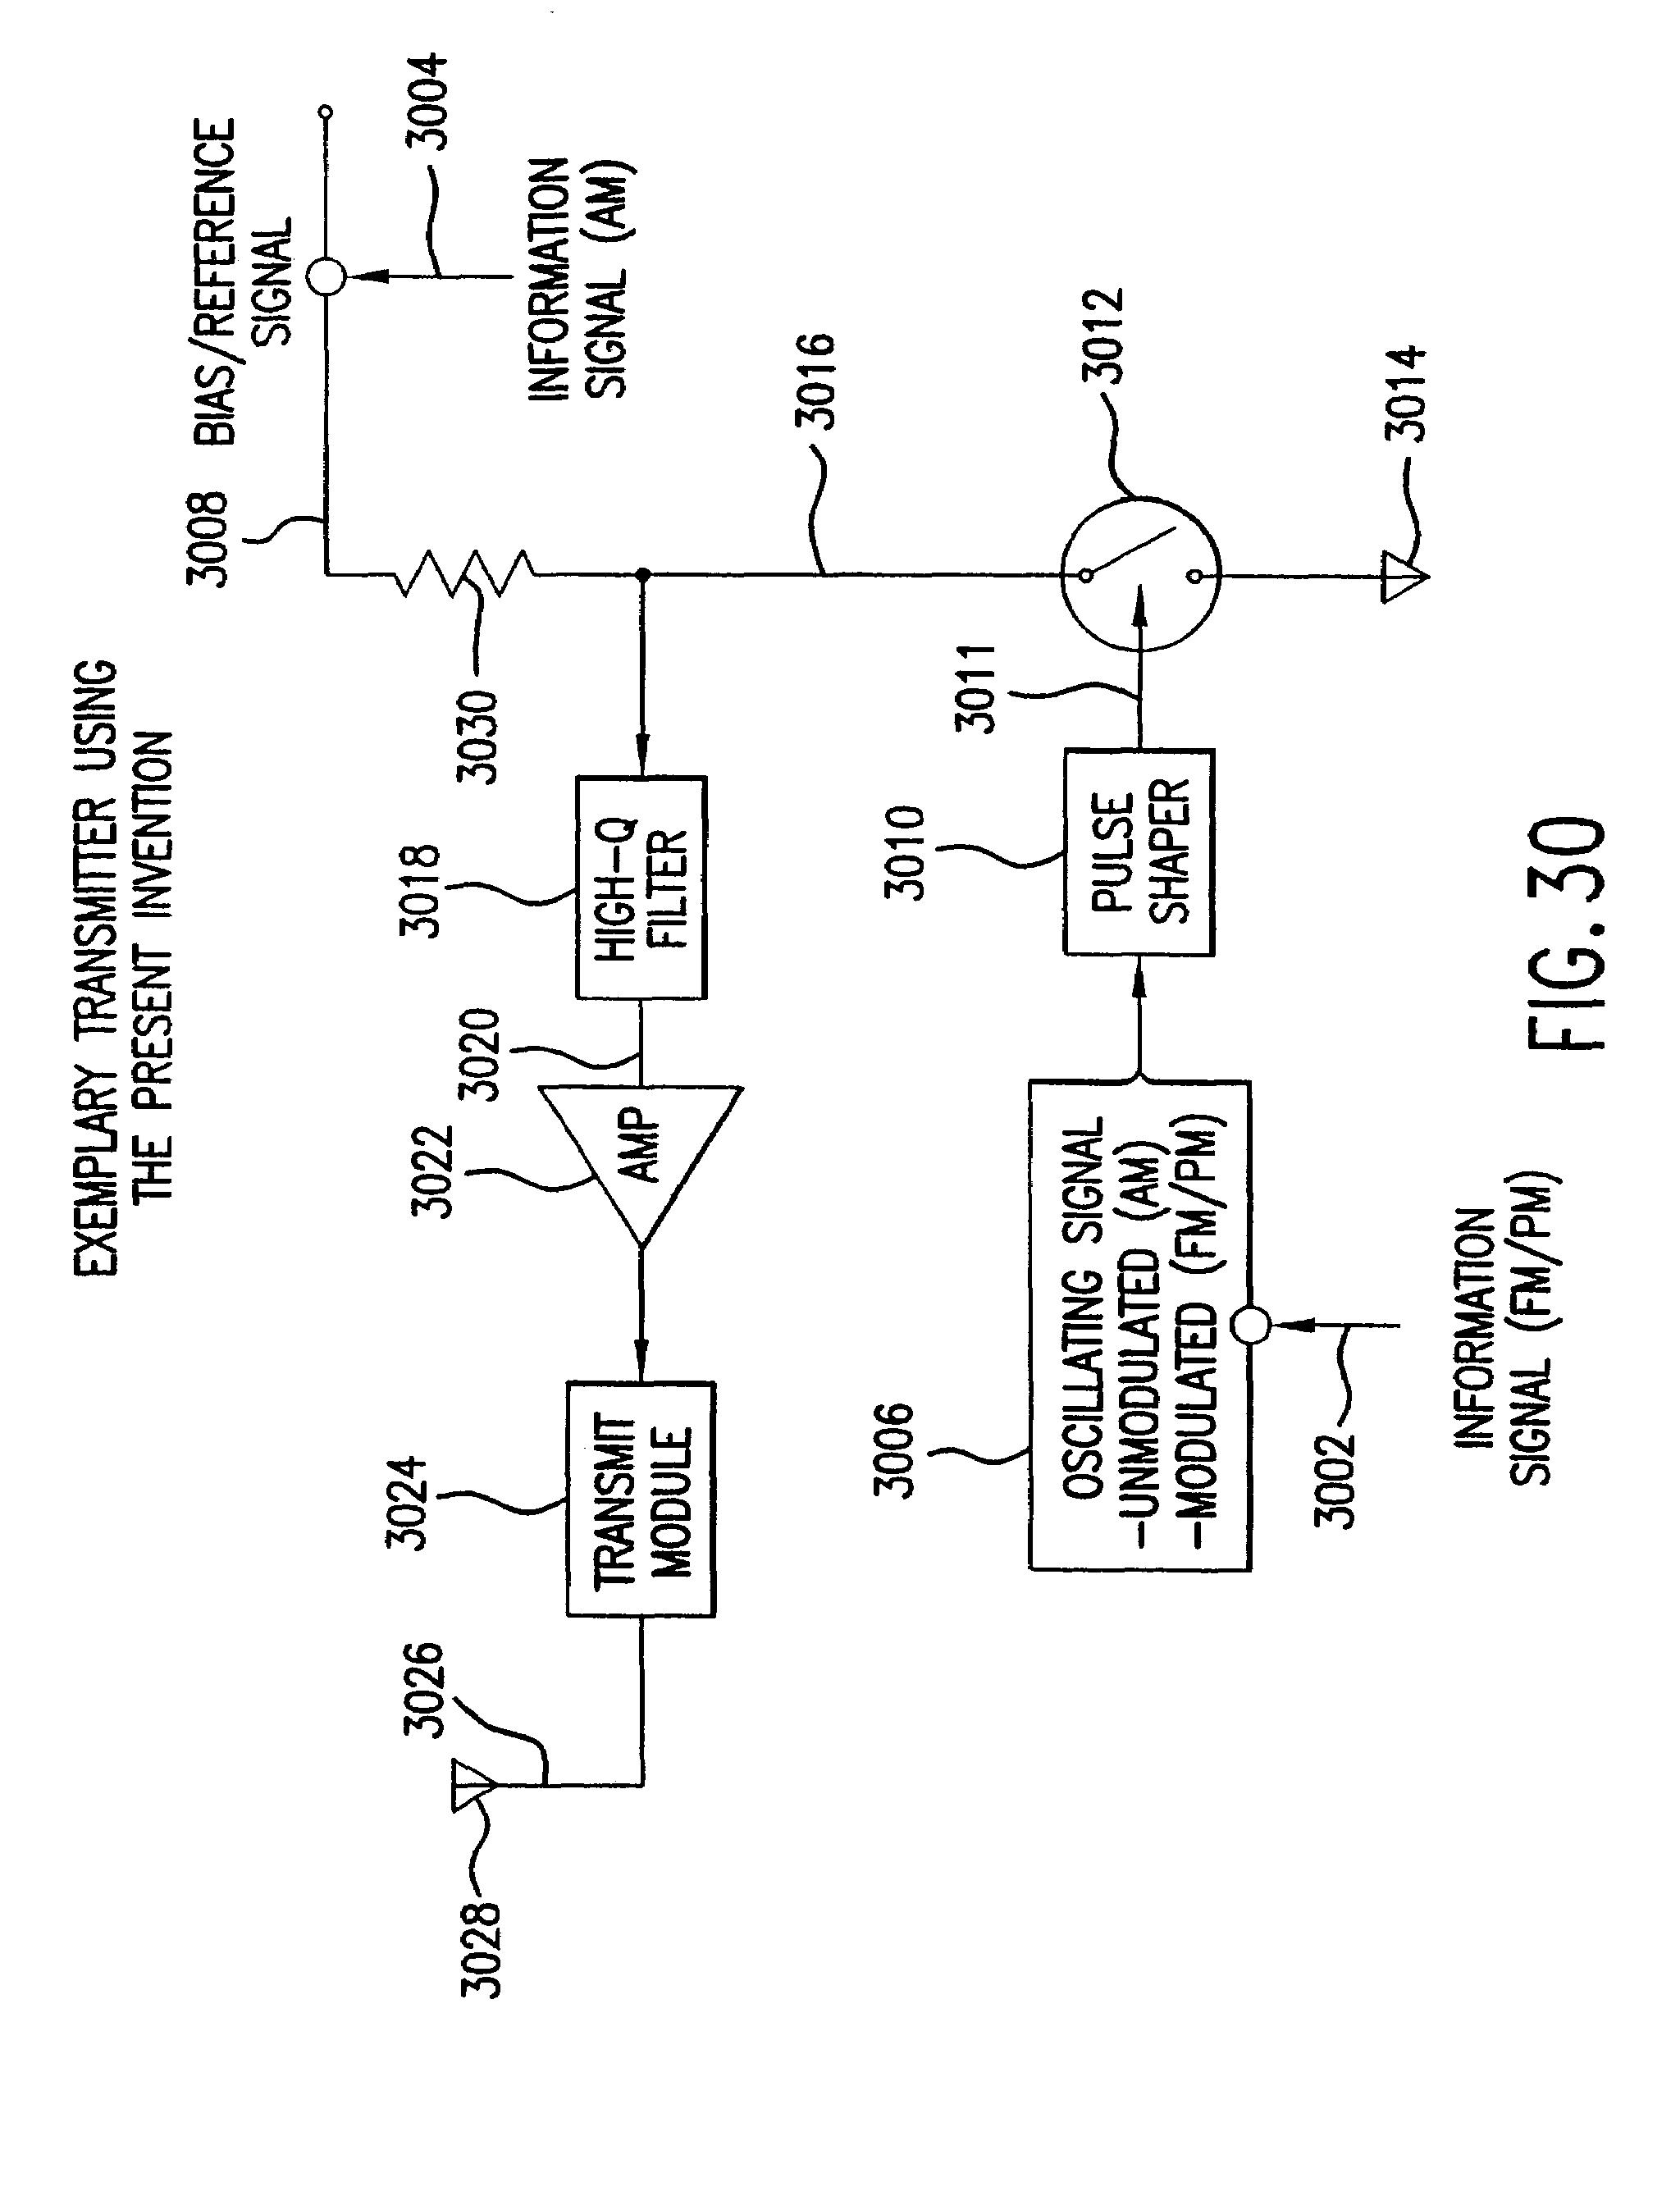 Patent Us 7496342 B2 Glitch Suppressor And Oscillator Circuits Using Cmos Inverter Gates Images